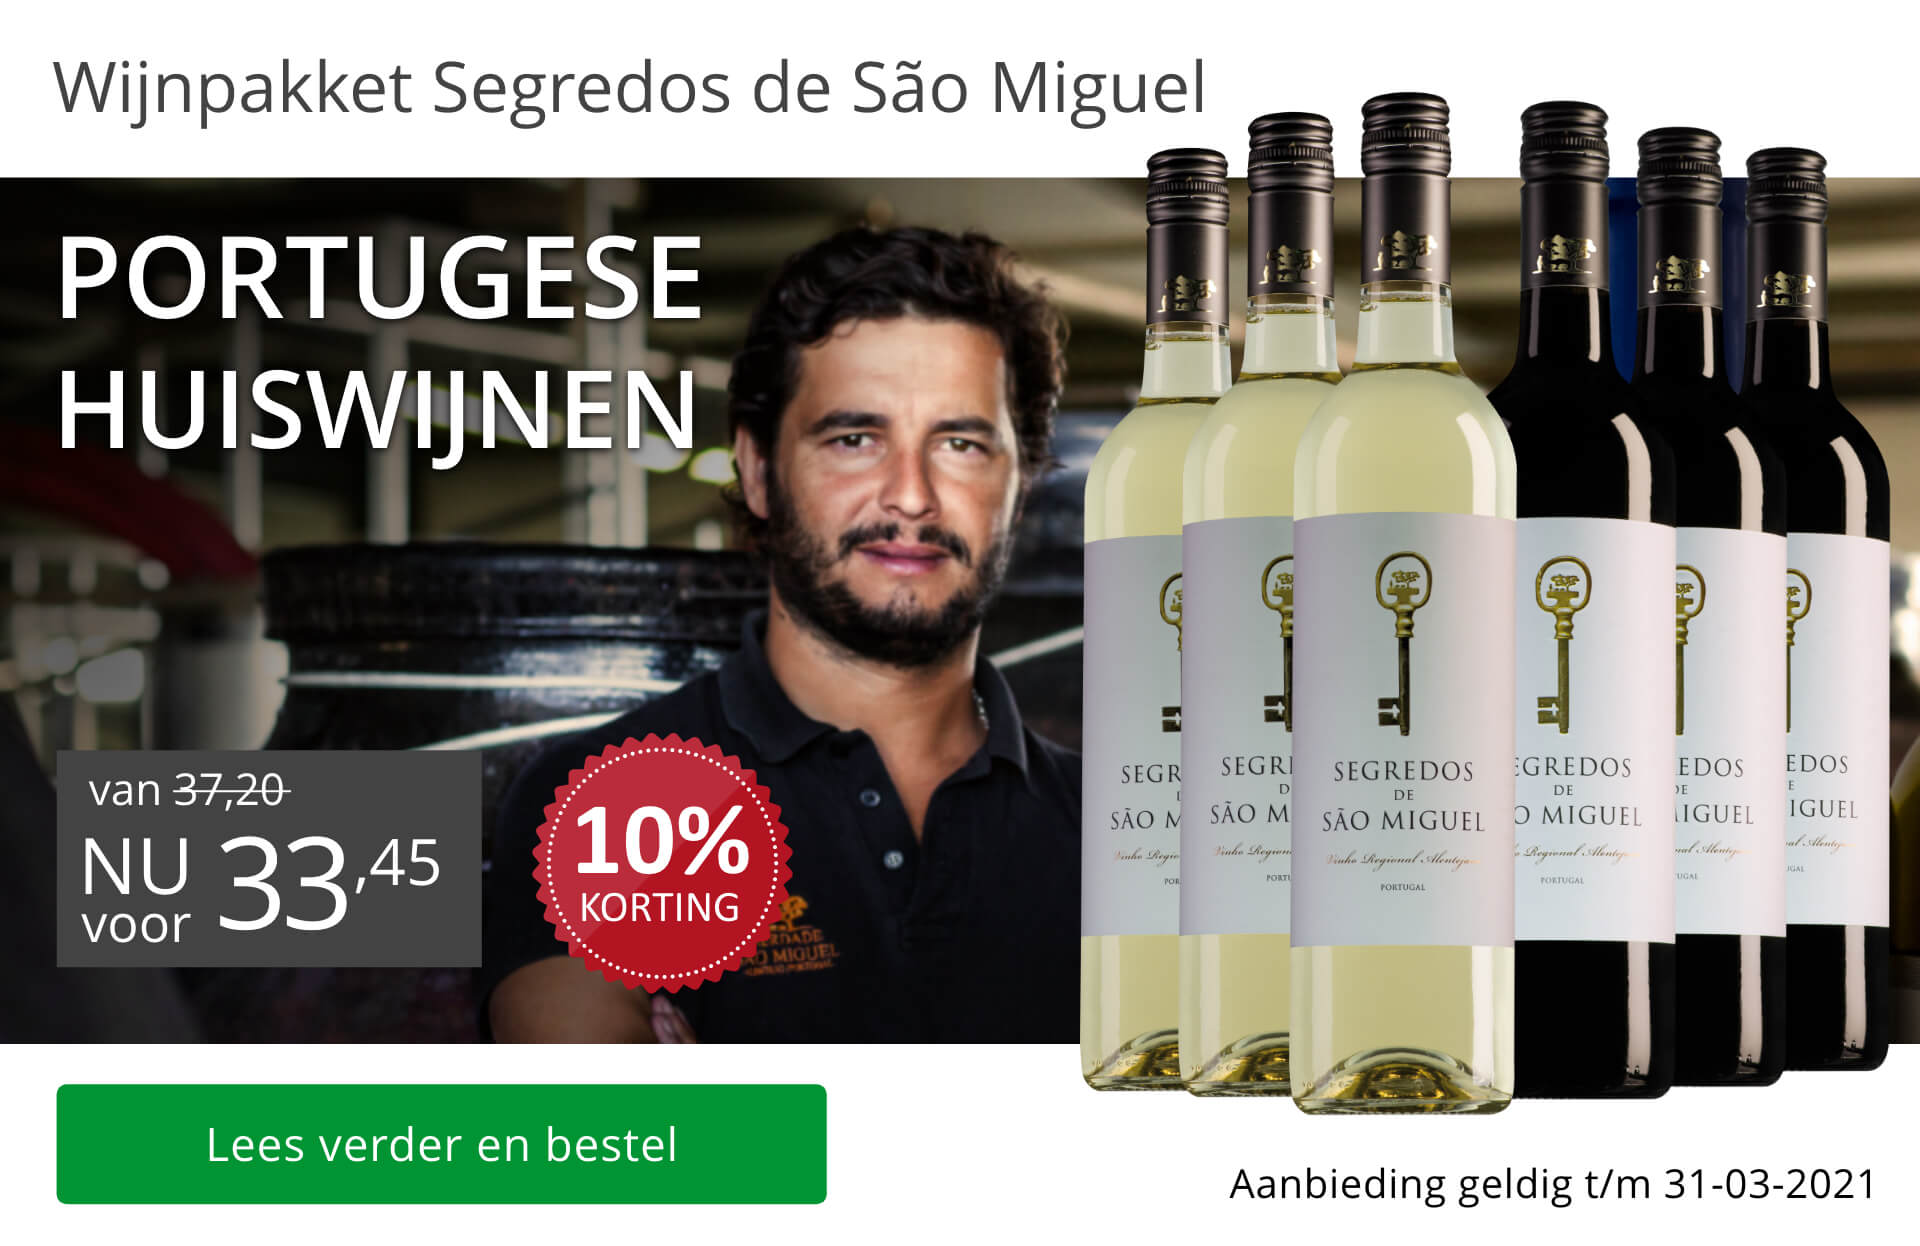 Wijnpakket Segredos de São Miguel